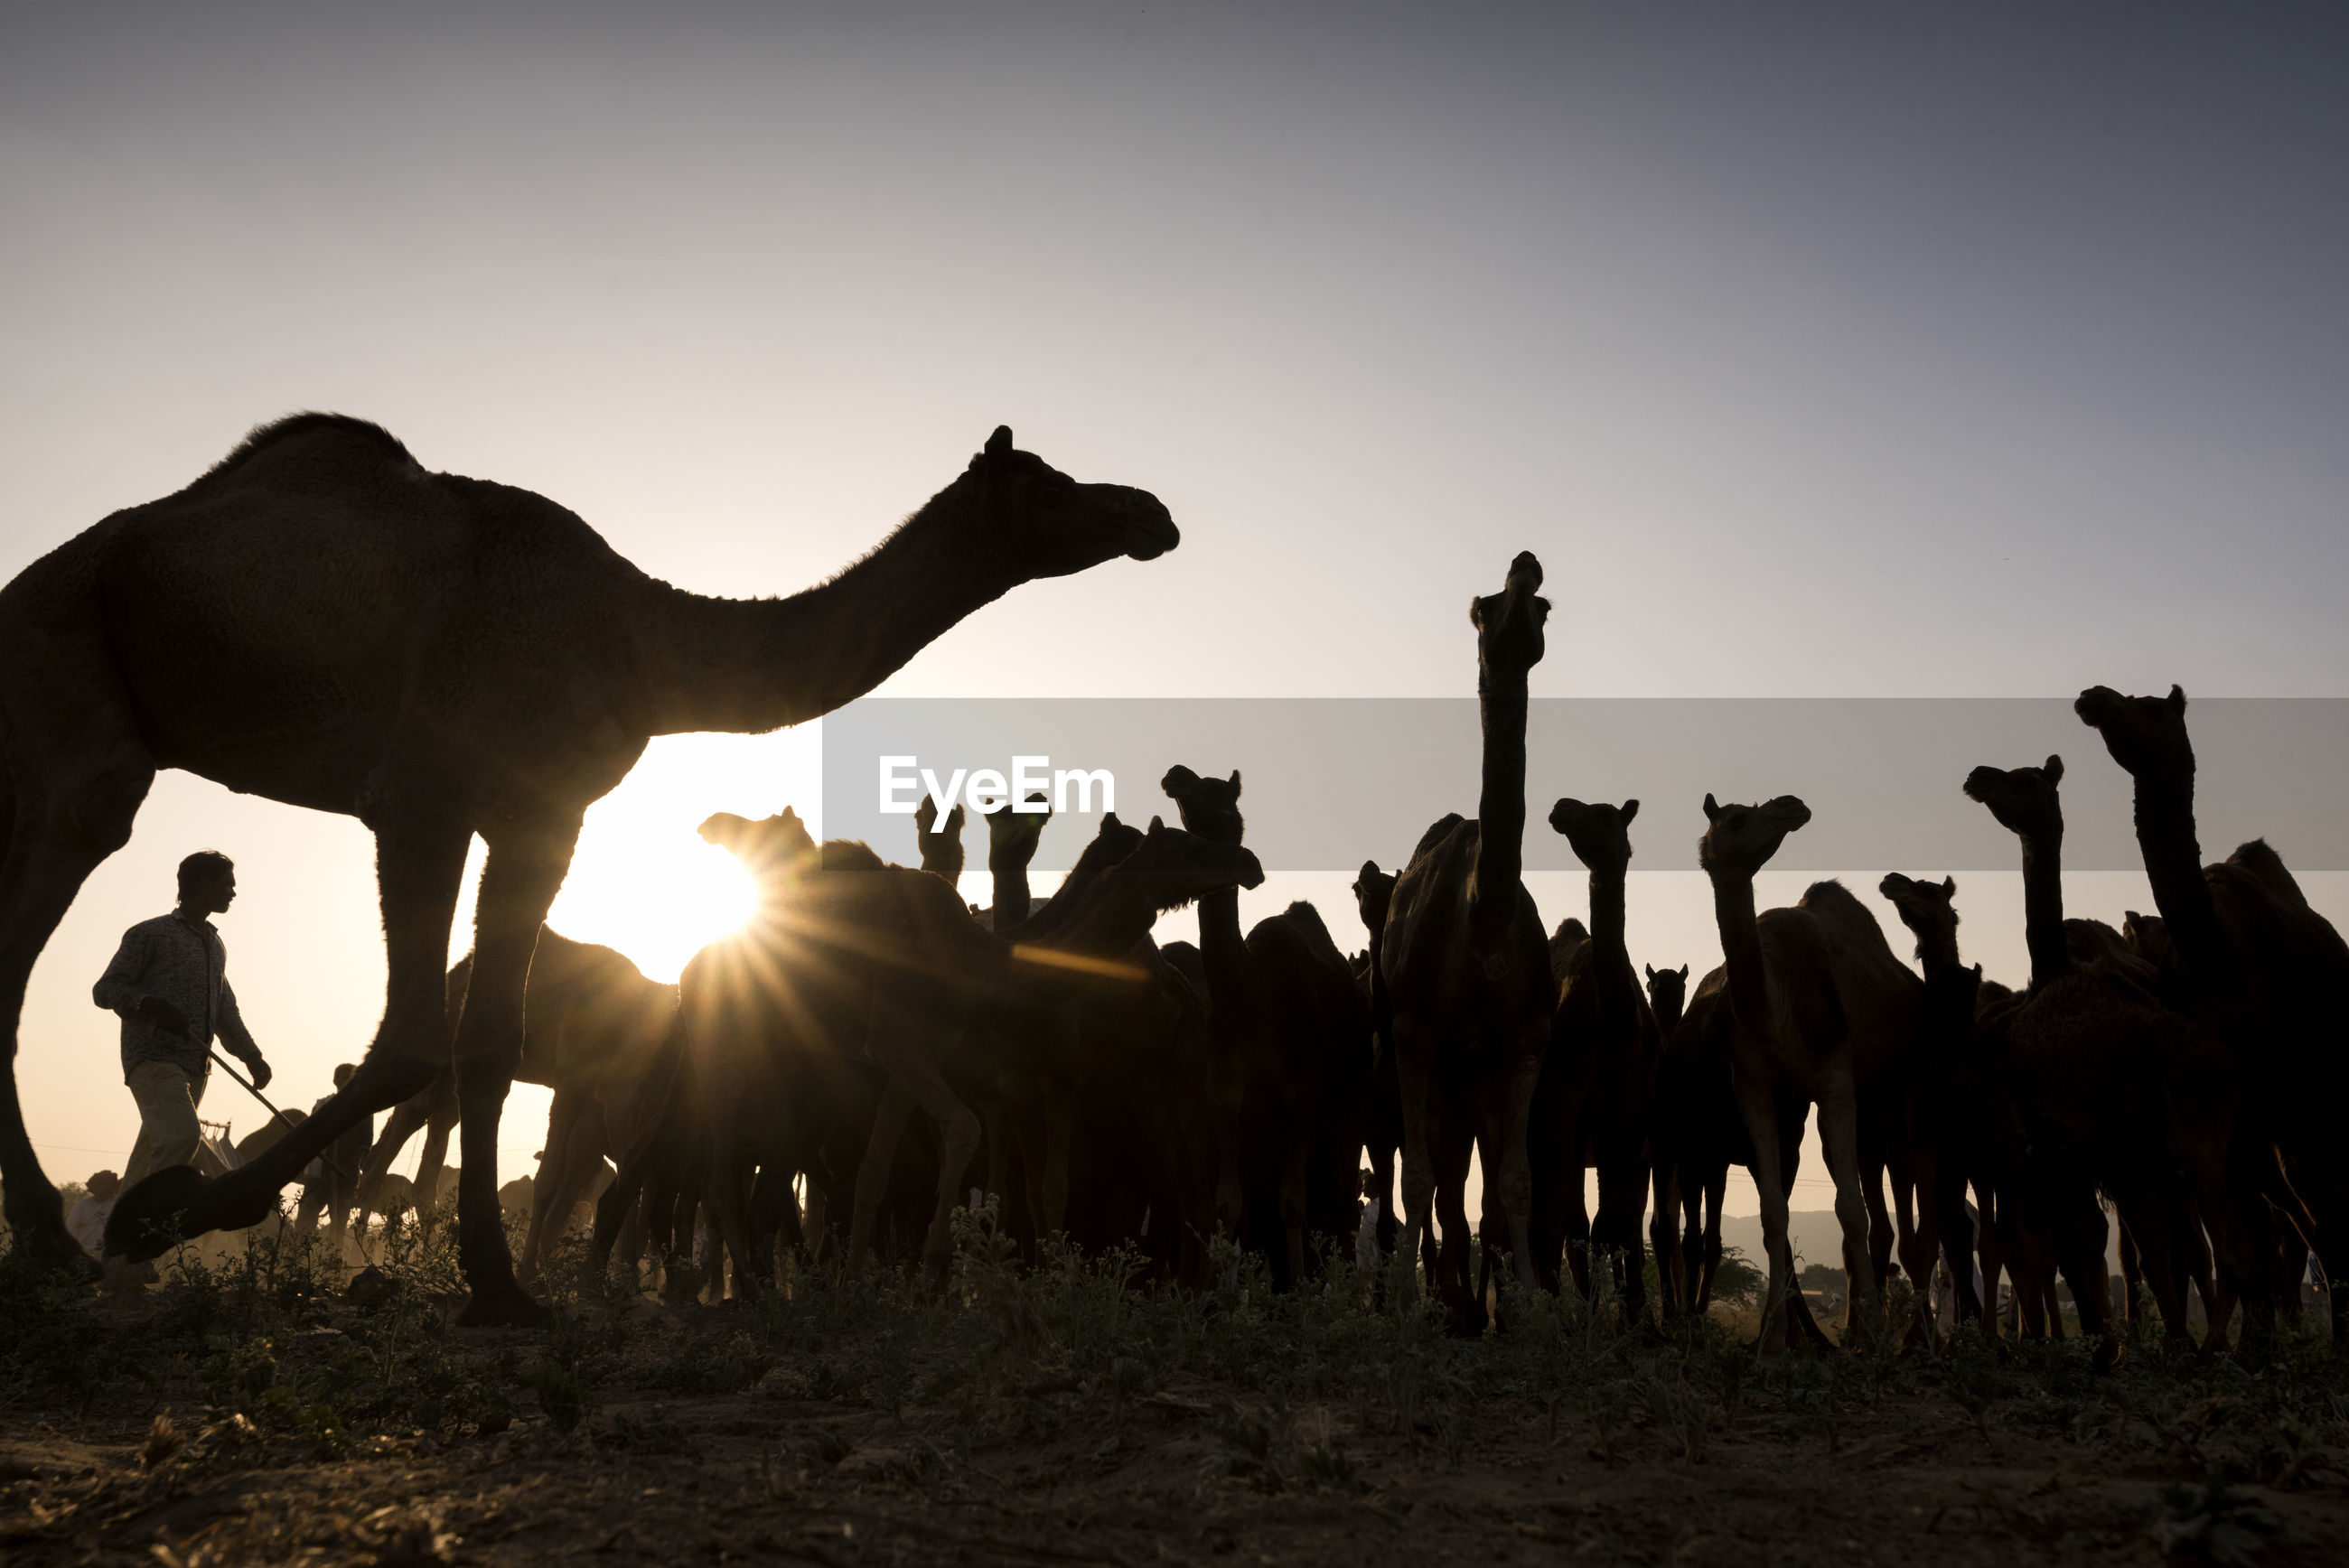 SILHOUETTE PEOPLE IN DESERT AGAINST SKY